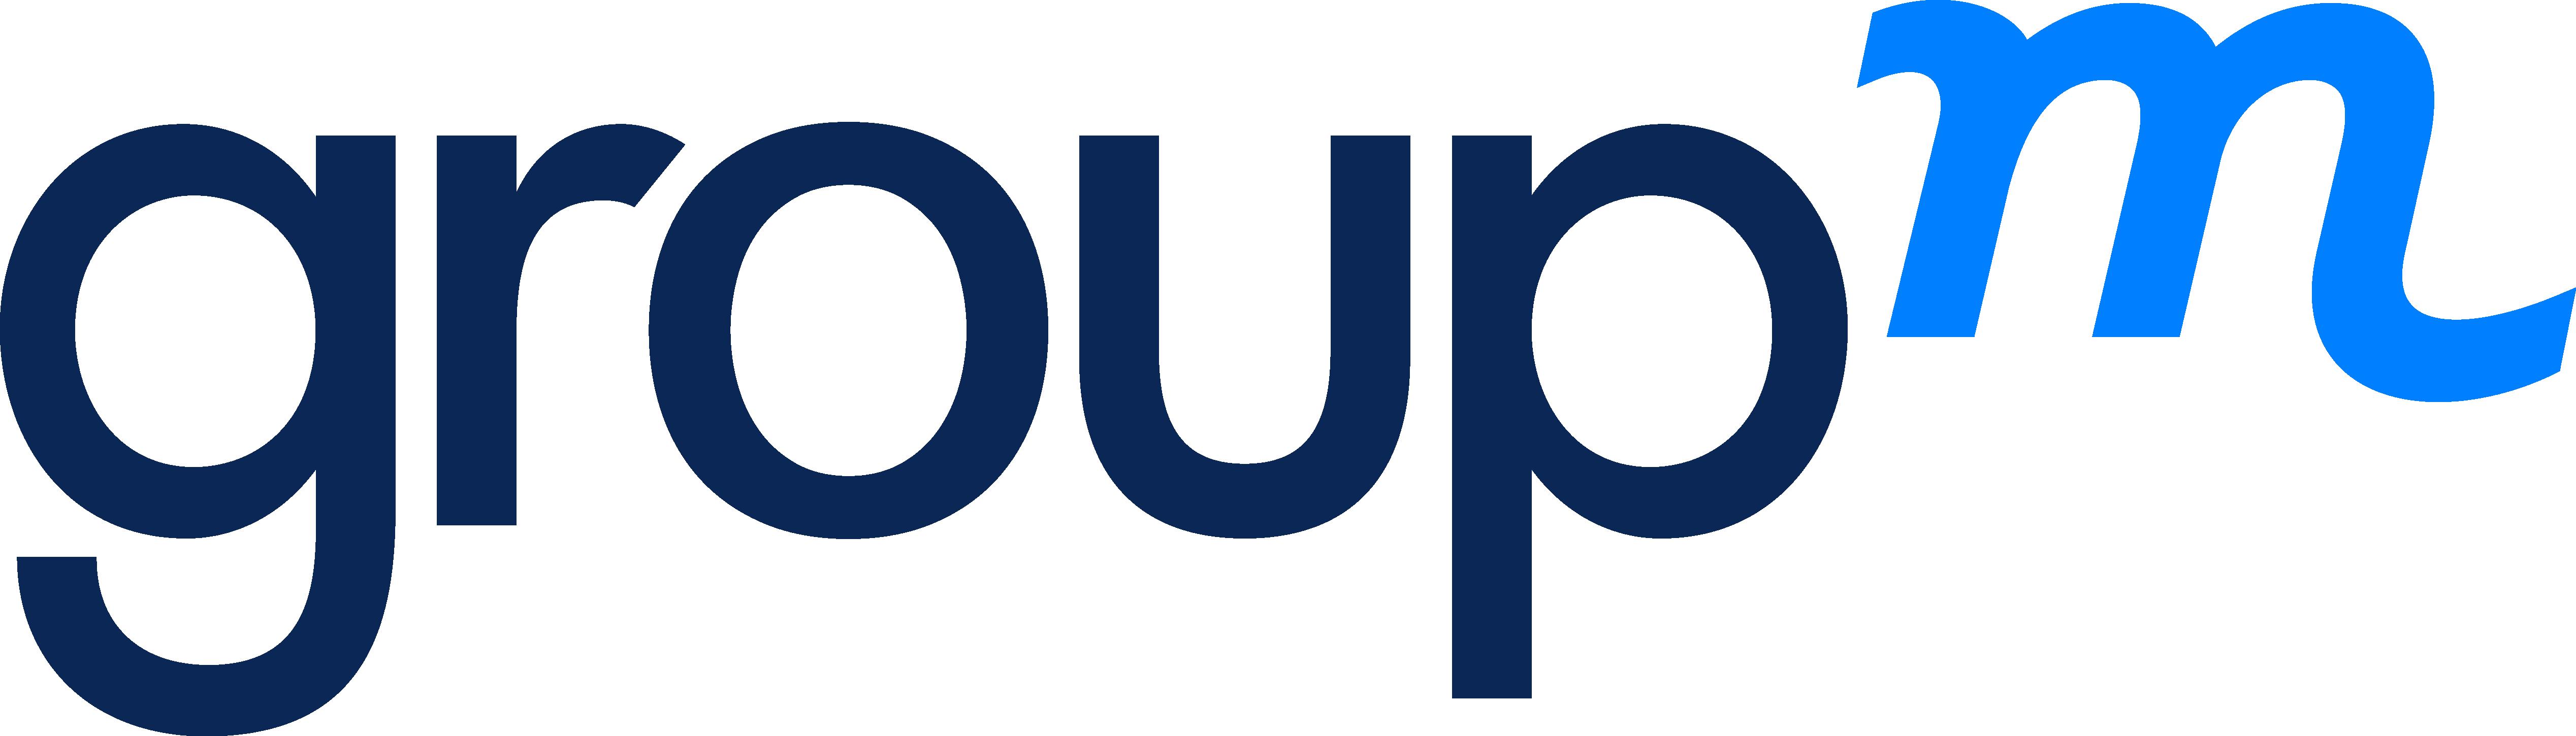 Customer Logo #2 of Proxi.cloud